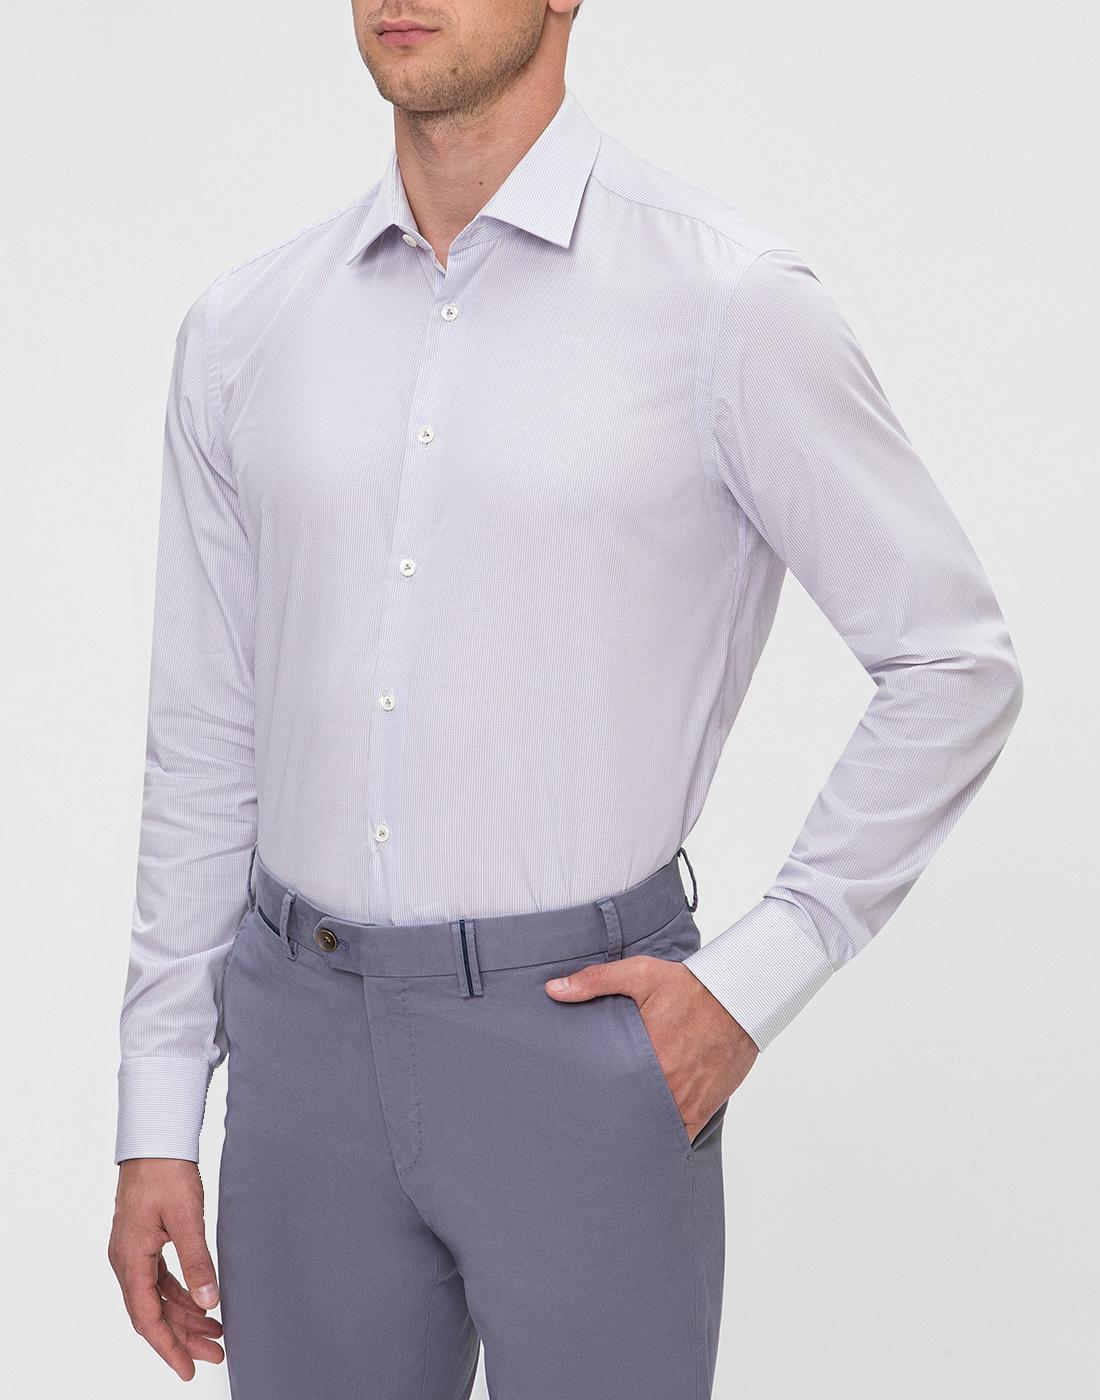 Мужская сиреневая рубашка Van Laack S163209/020-3